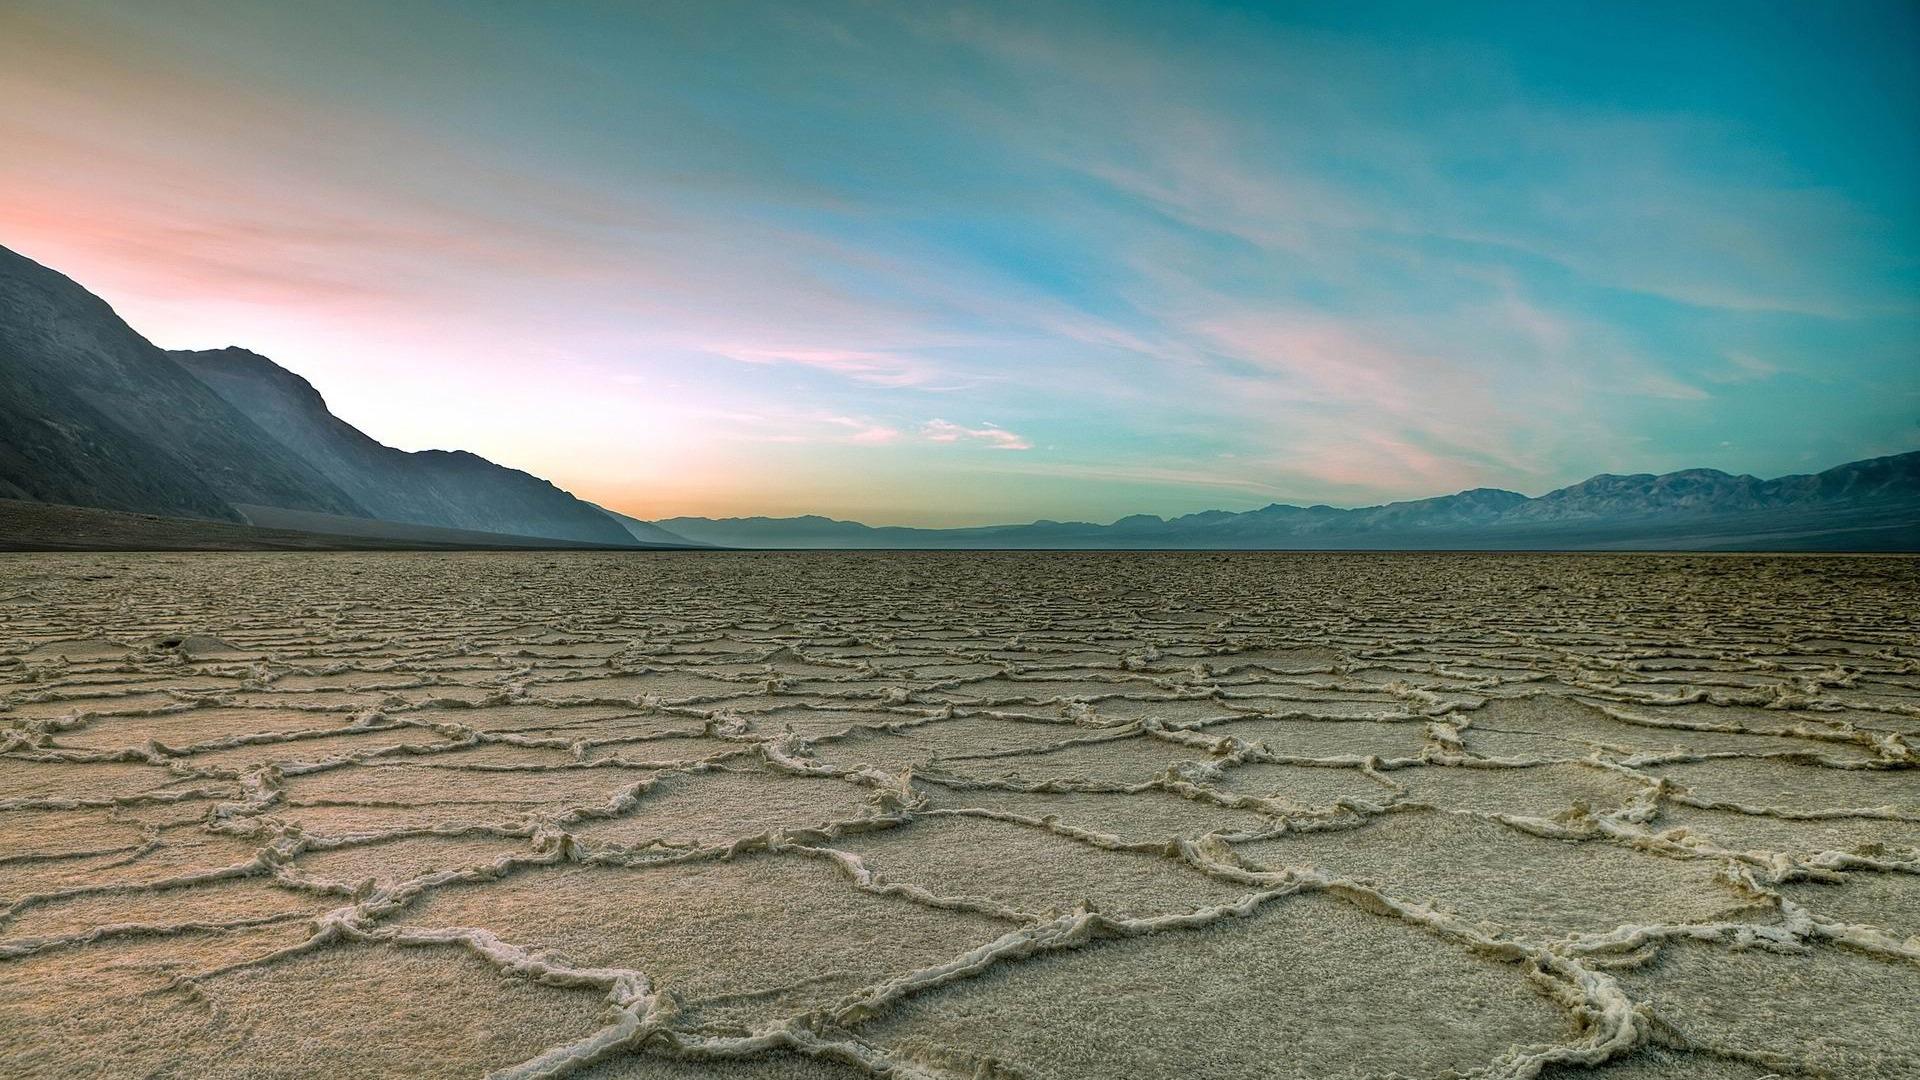 Death_Valley_National_Park-2012_landscape_Featured_Wallpaper_1920x1080.jpg